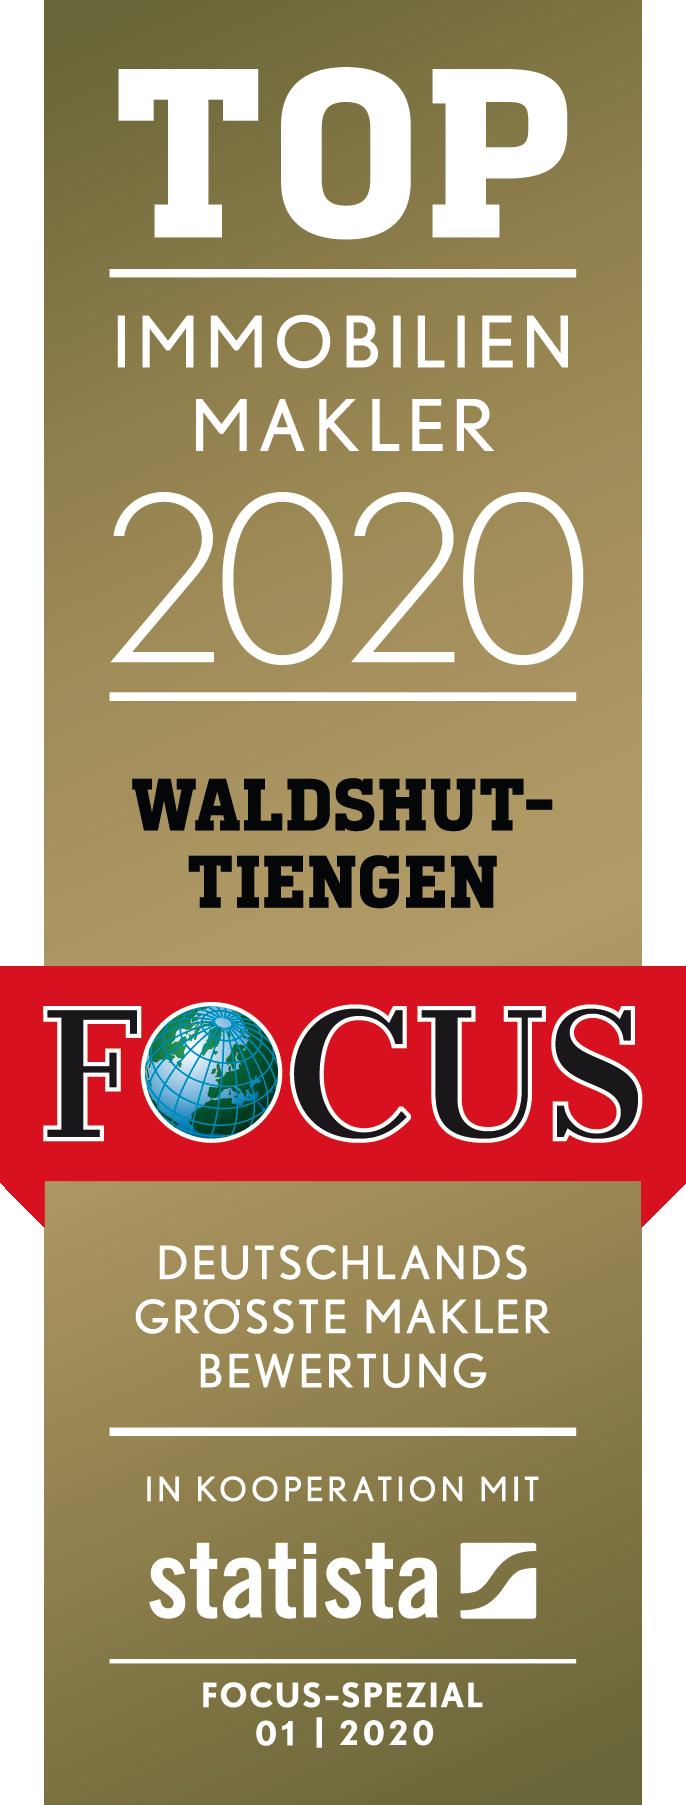 FCS_Siegel_TOP_Immobilienmakler_2020_Waldshut-Tiengen